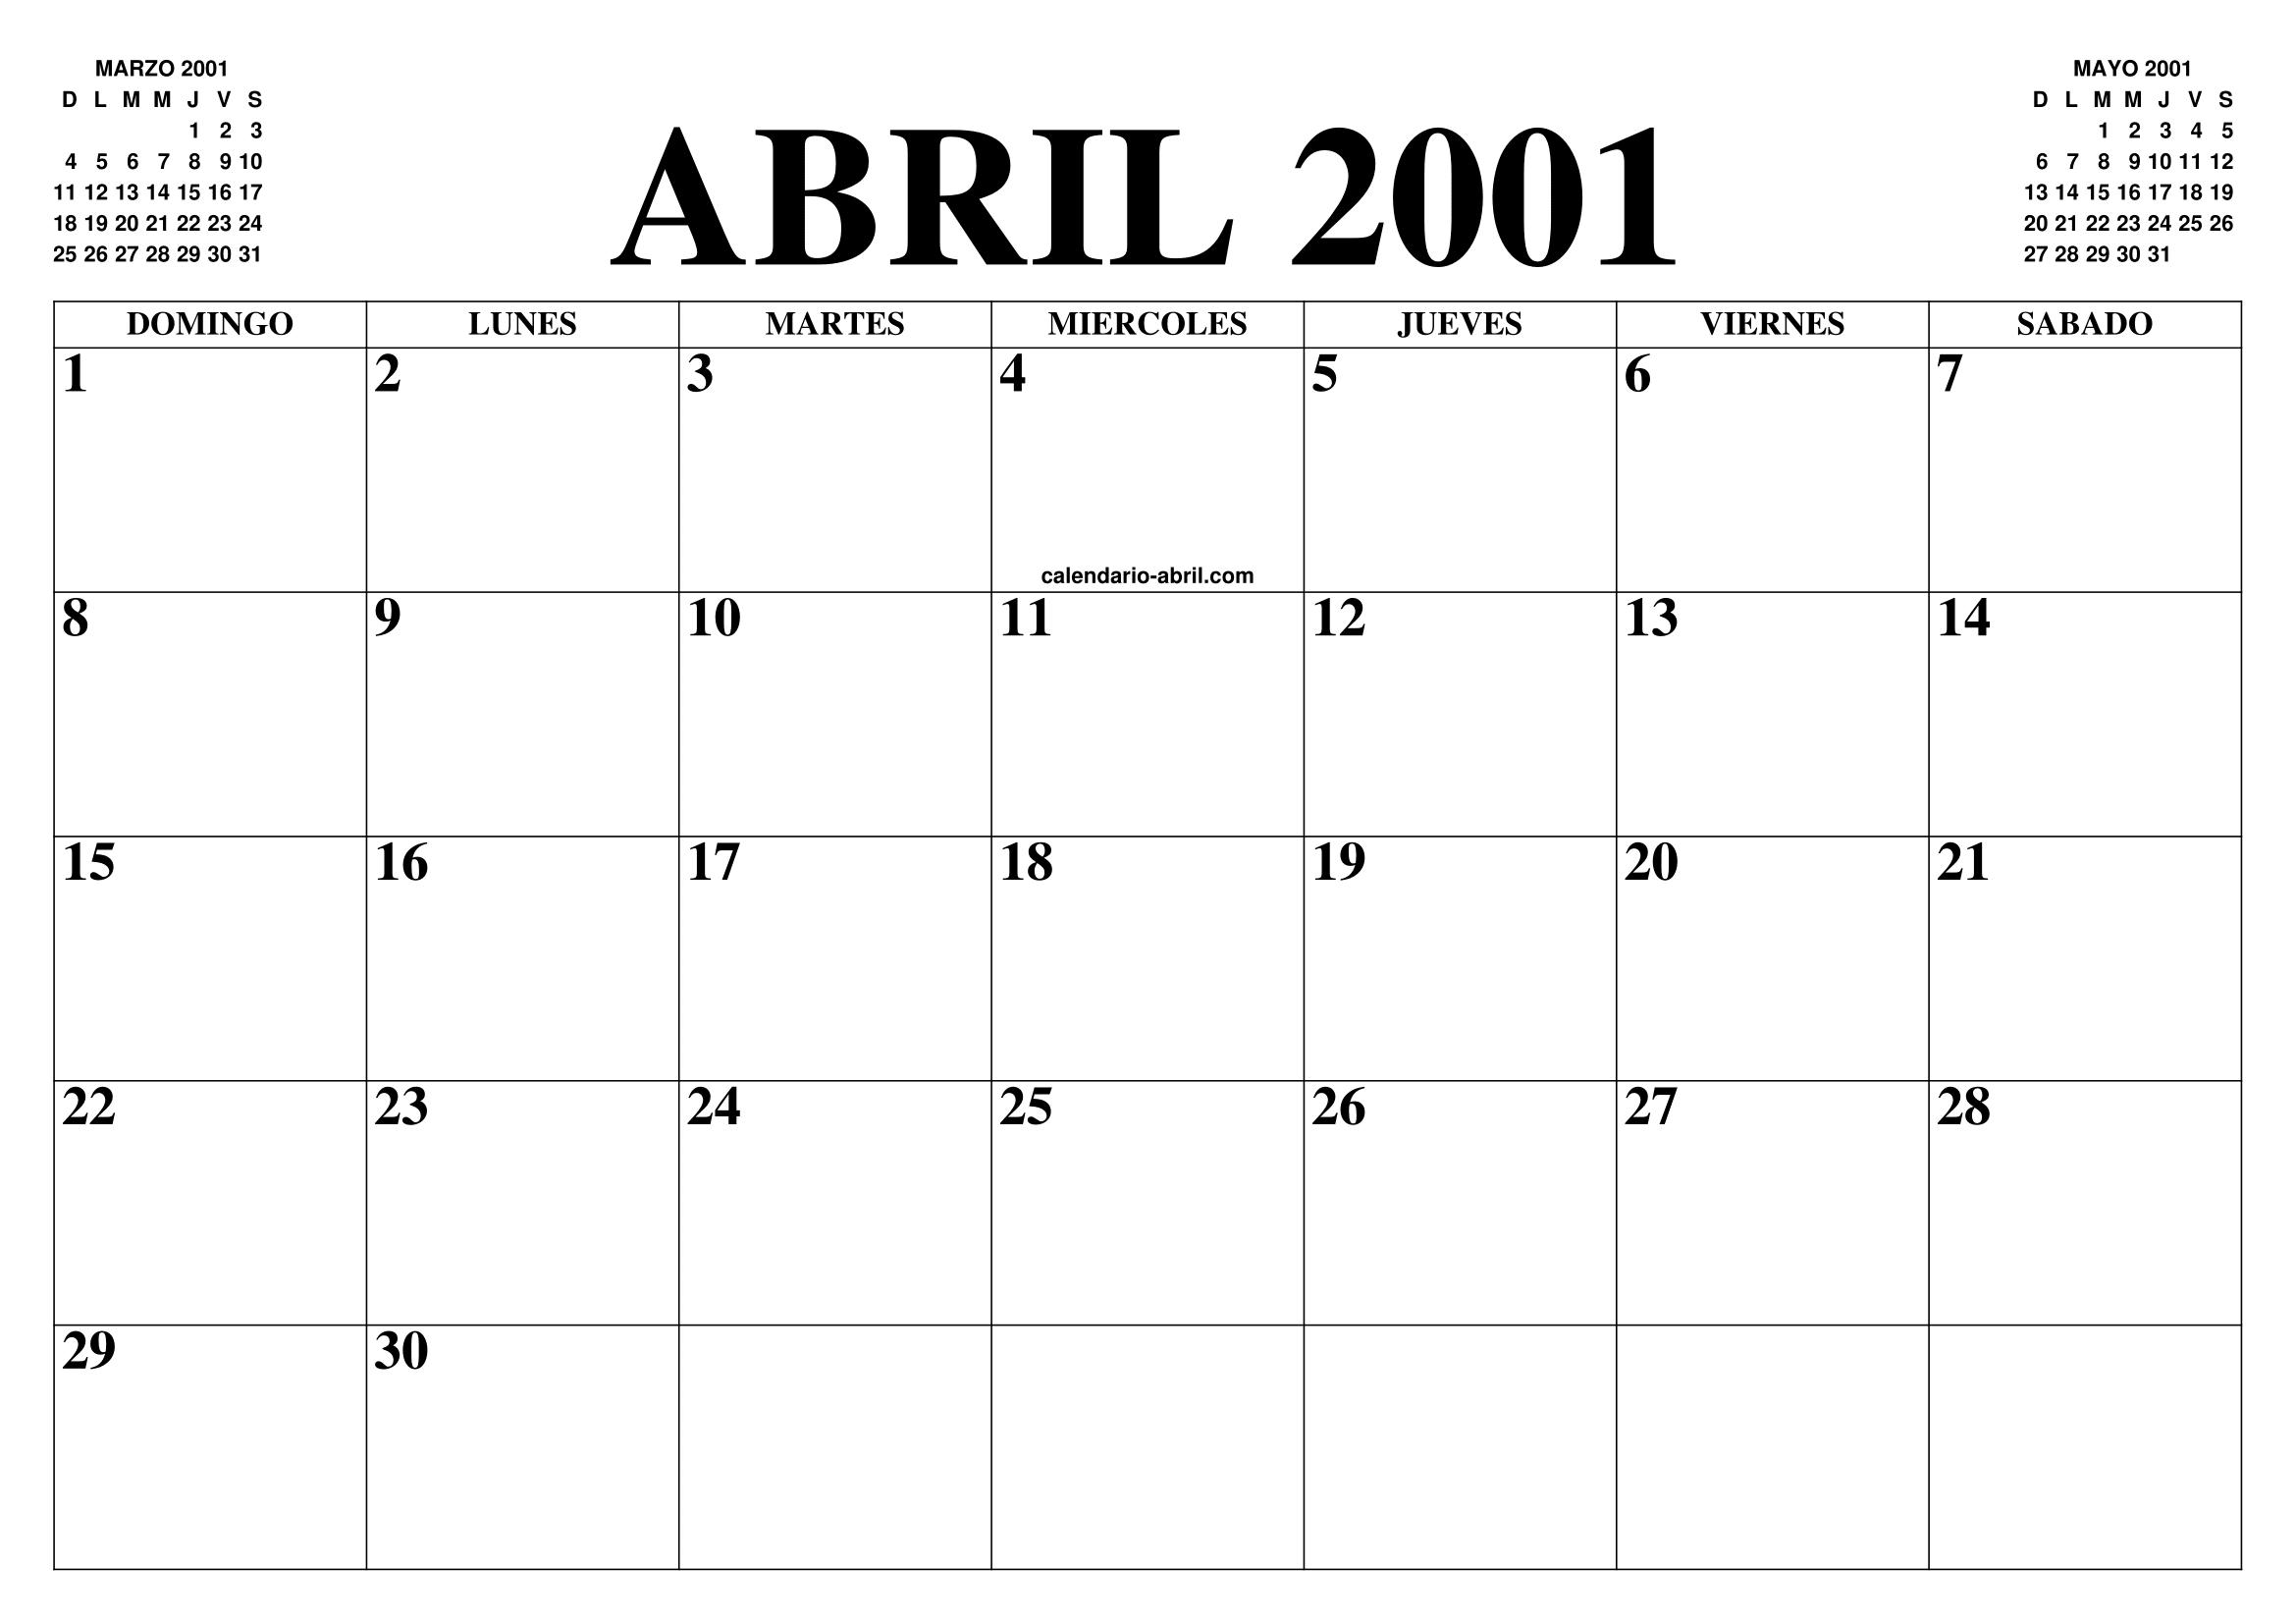 Calendario 2001.Calendario Abril 2001 El Calendario Abril Para Imprimir Gratis